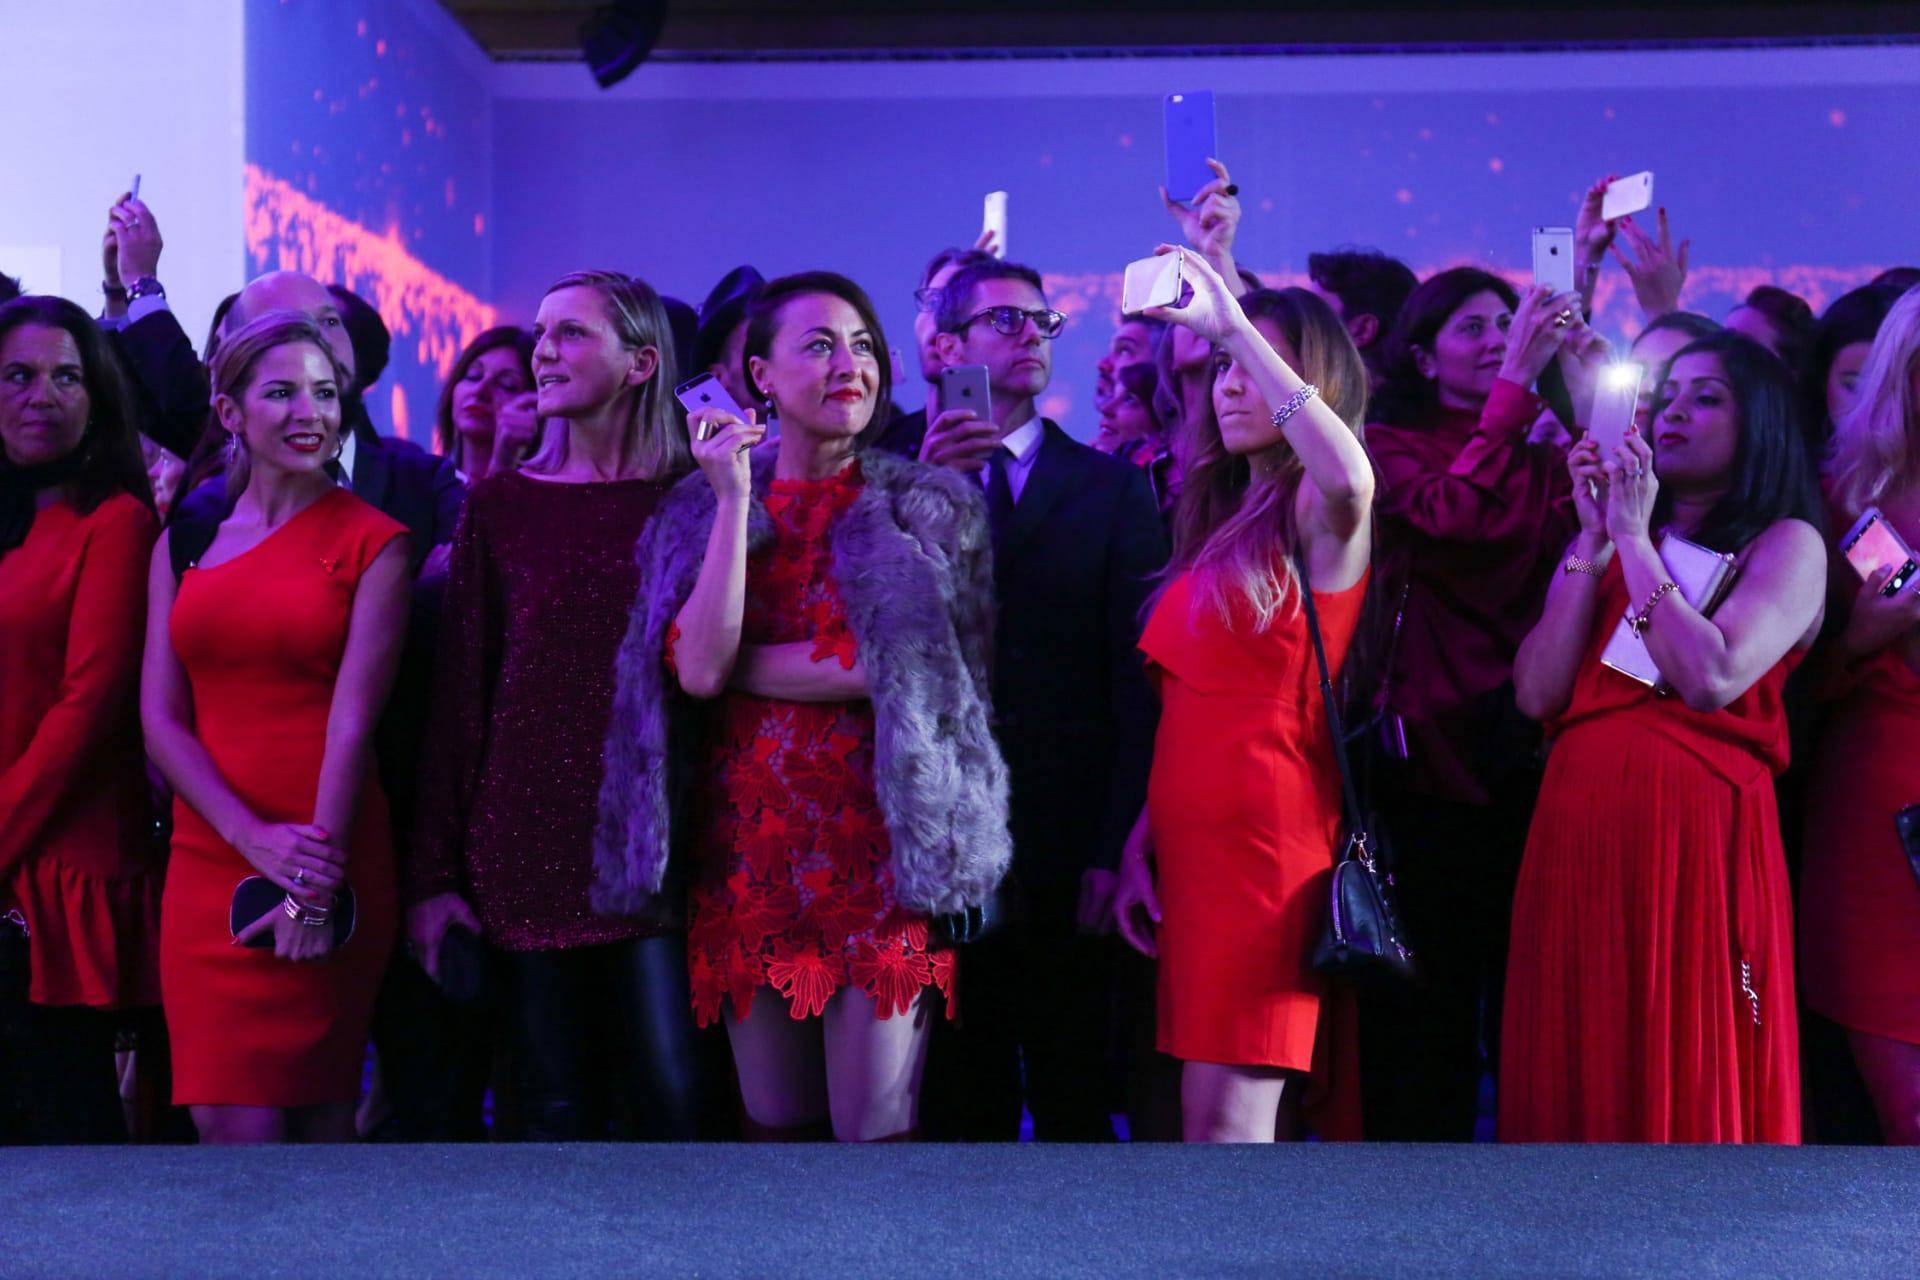 Pasarela fashion show Barcelona